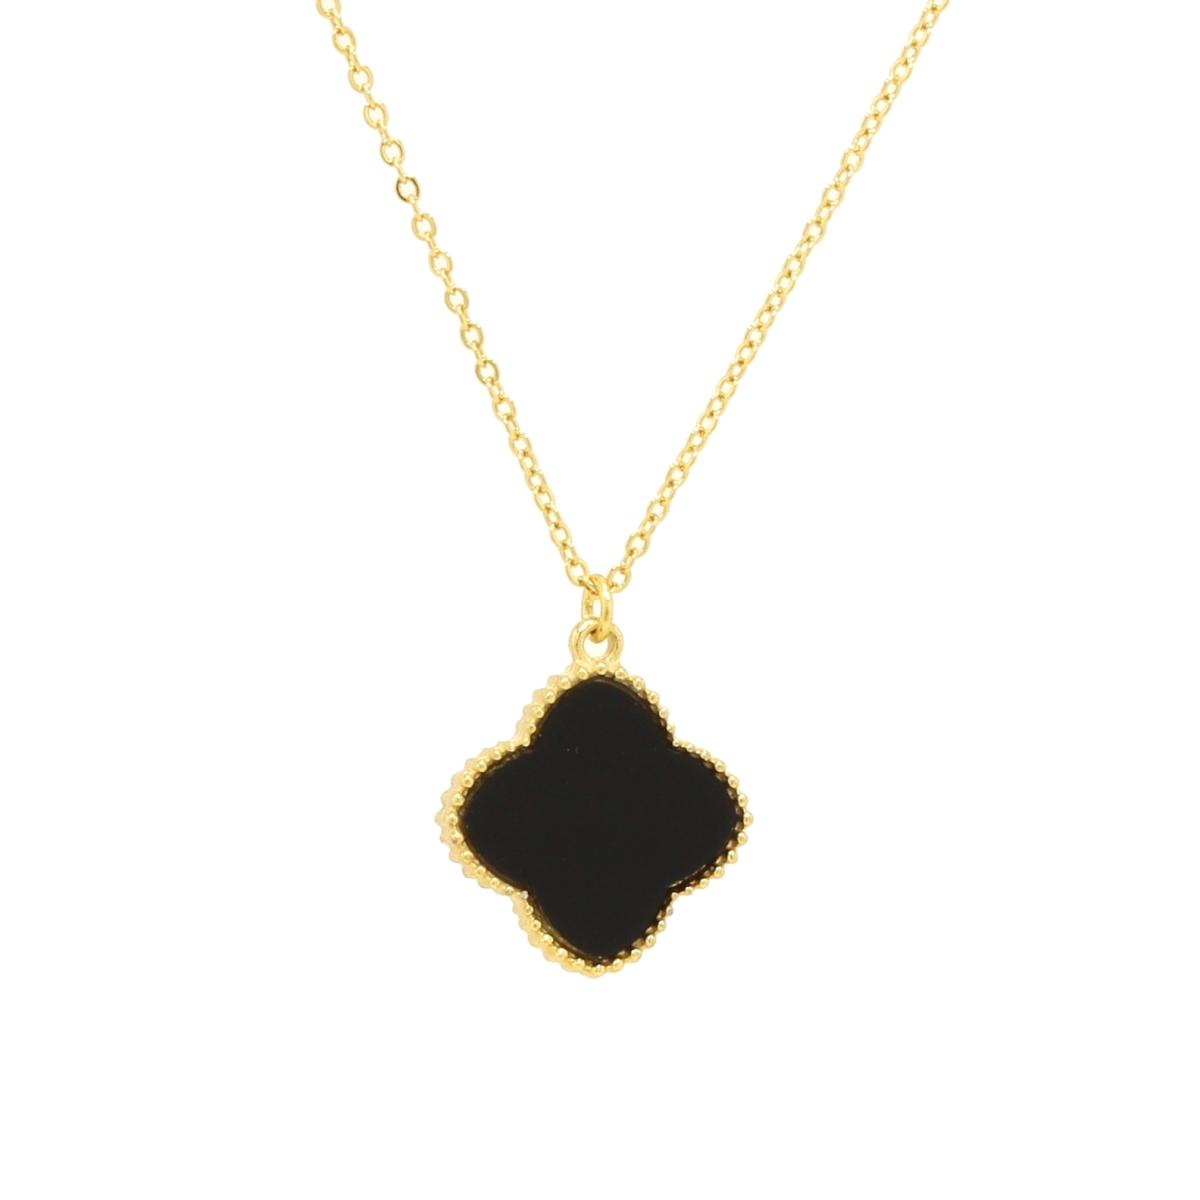 Hakuchobana Perlafiore Some Mil Gold Flower Necklaces Size Grain